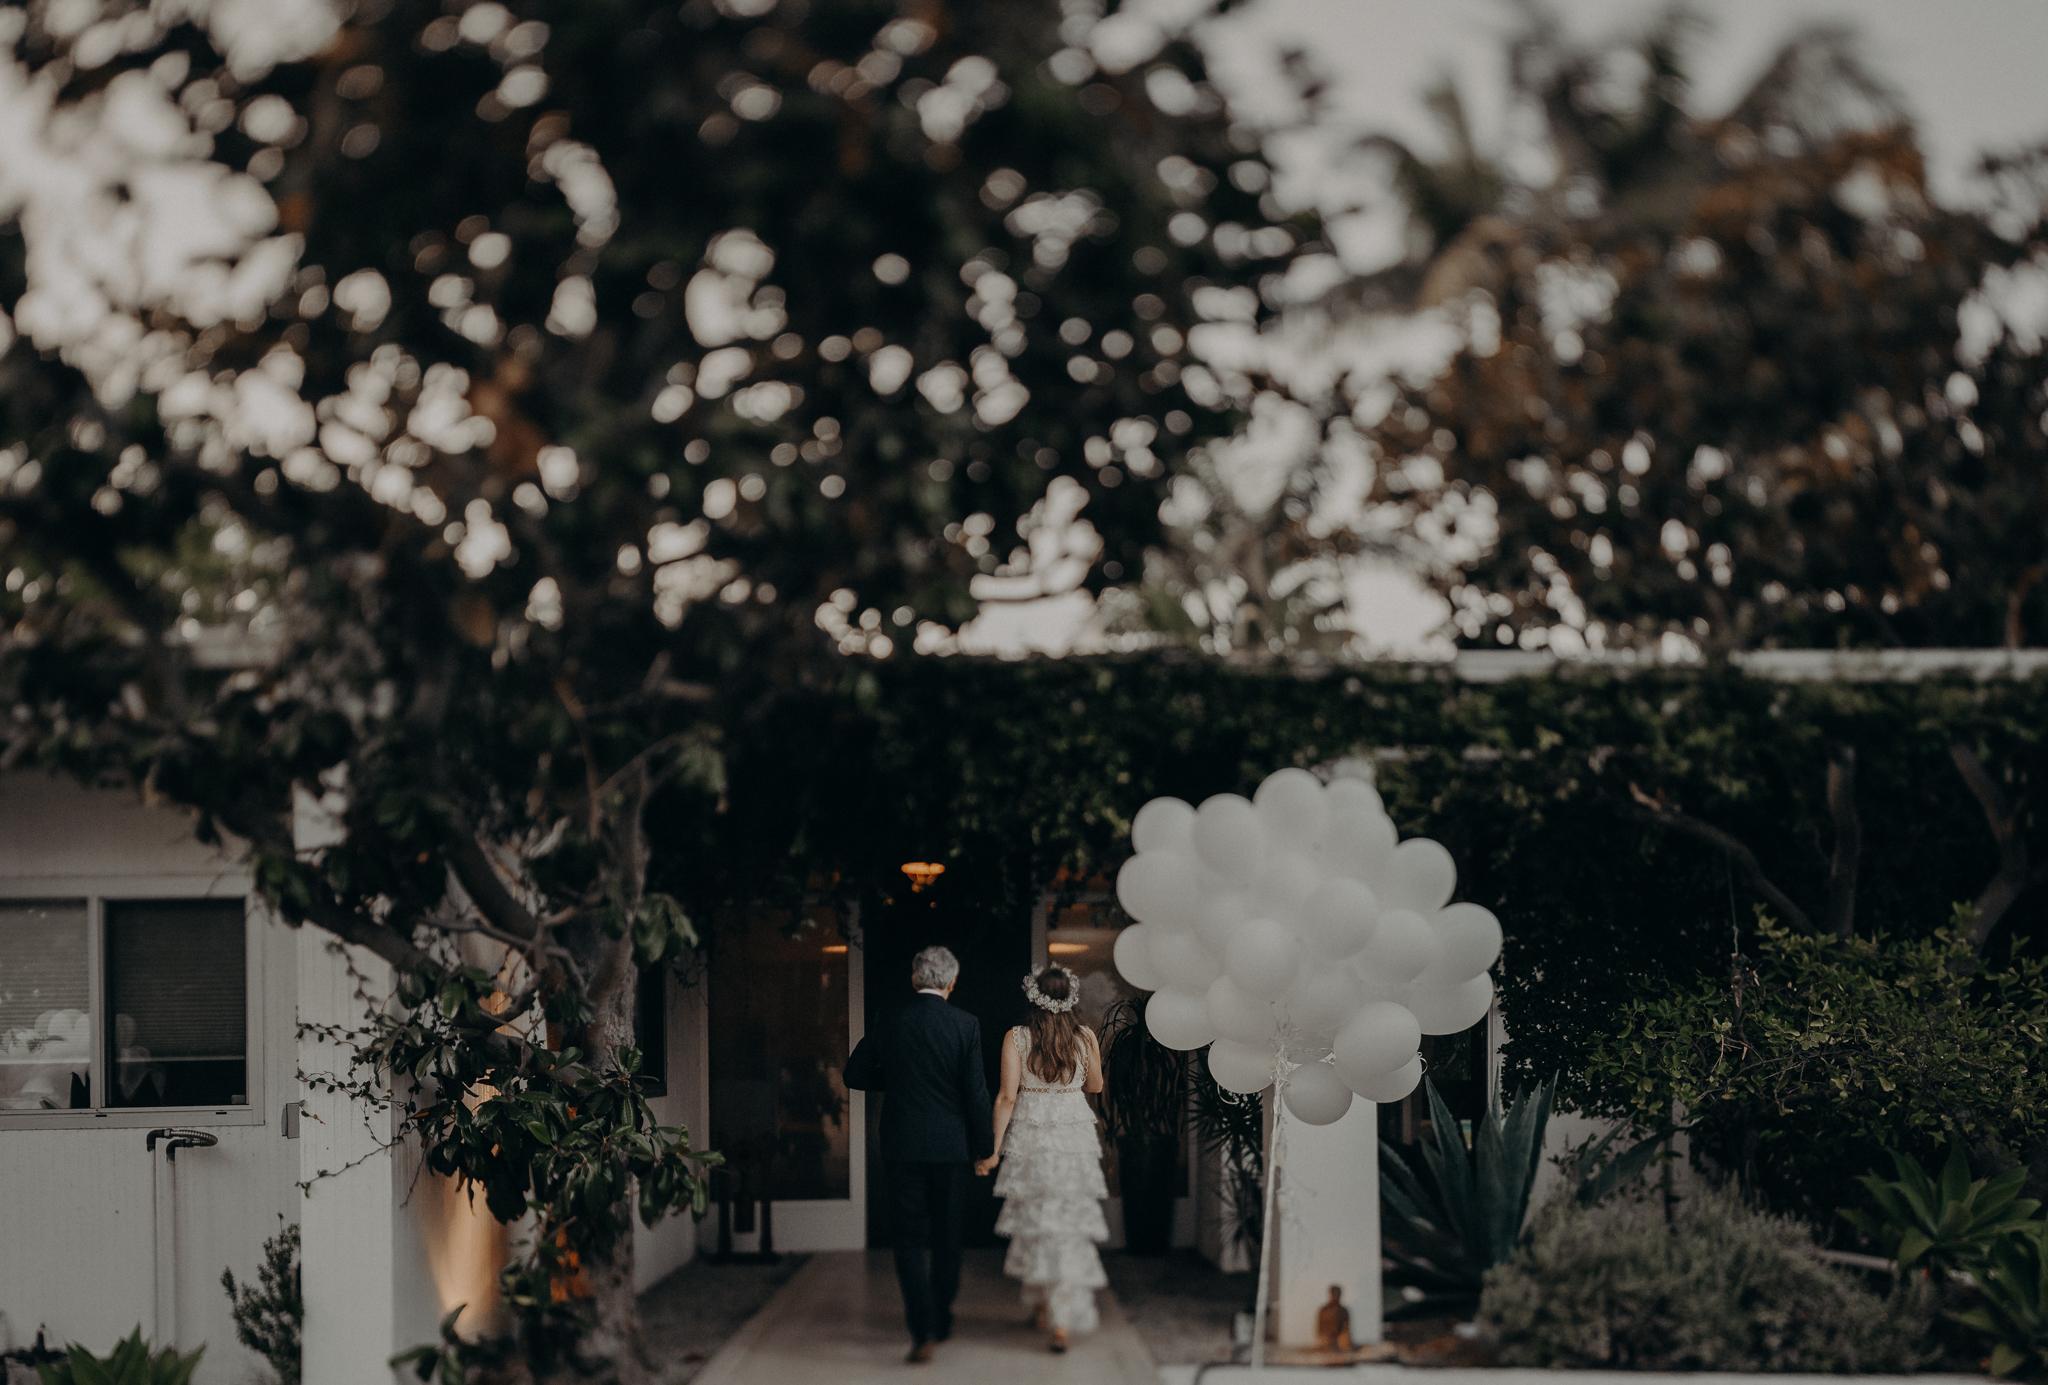 Isaiah + Taylor Photography - Private Estate Backyard Wedding - Beverly Hills - Los Angeles Wedding Photographer - 125.jpg